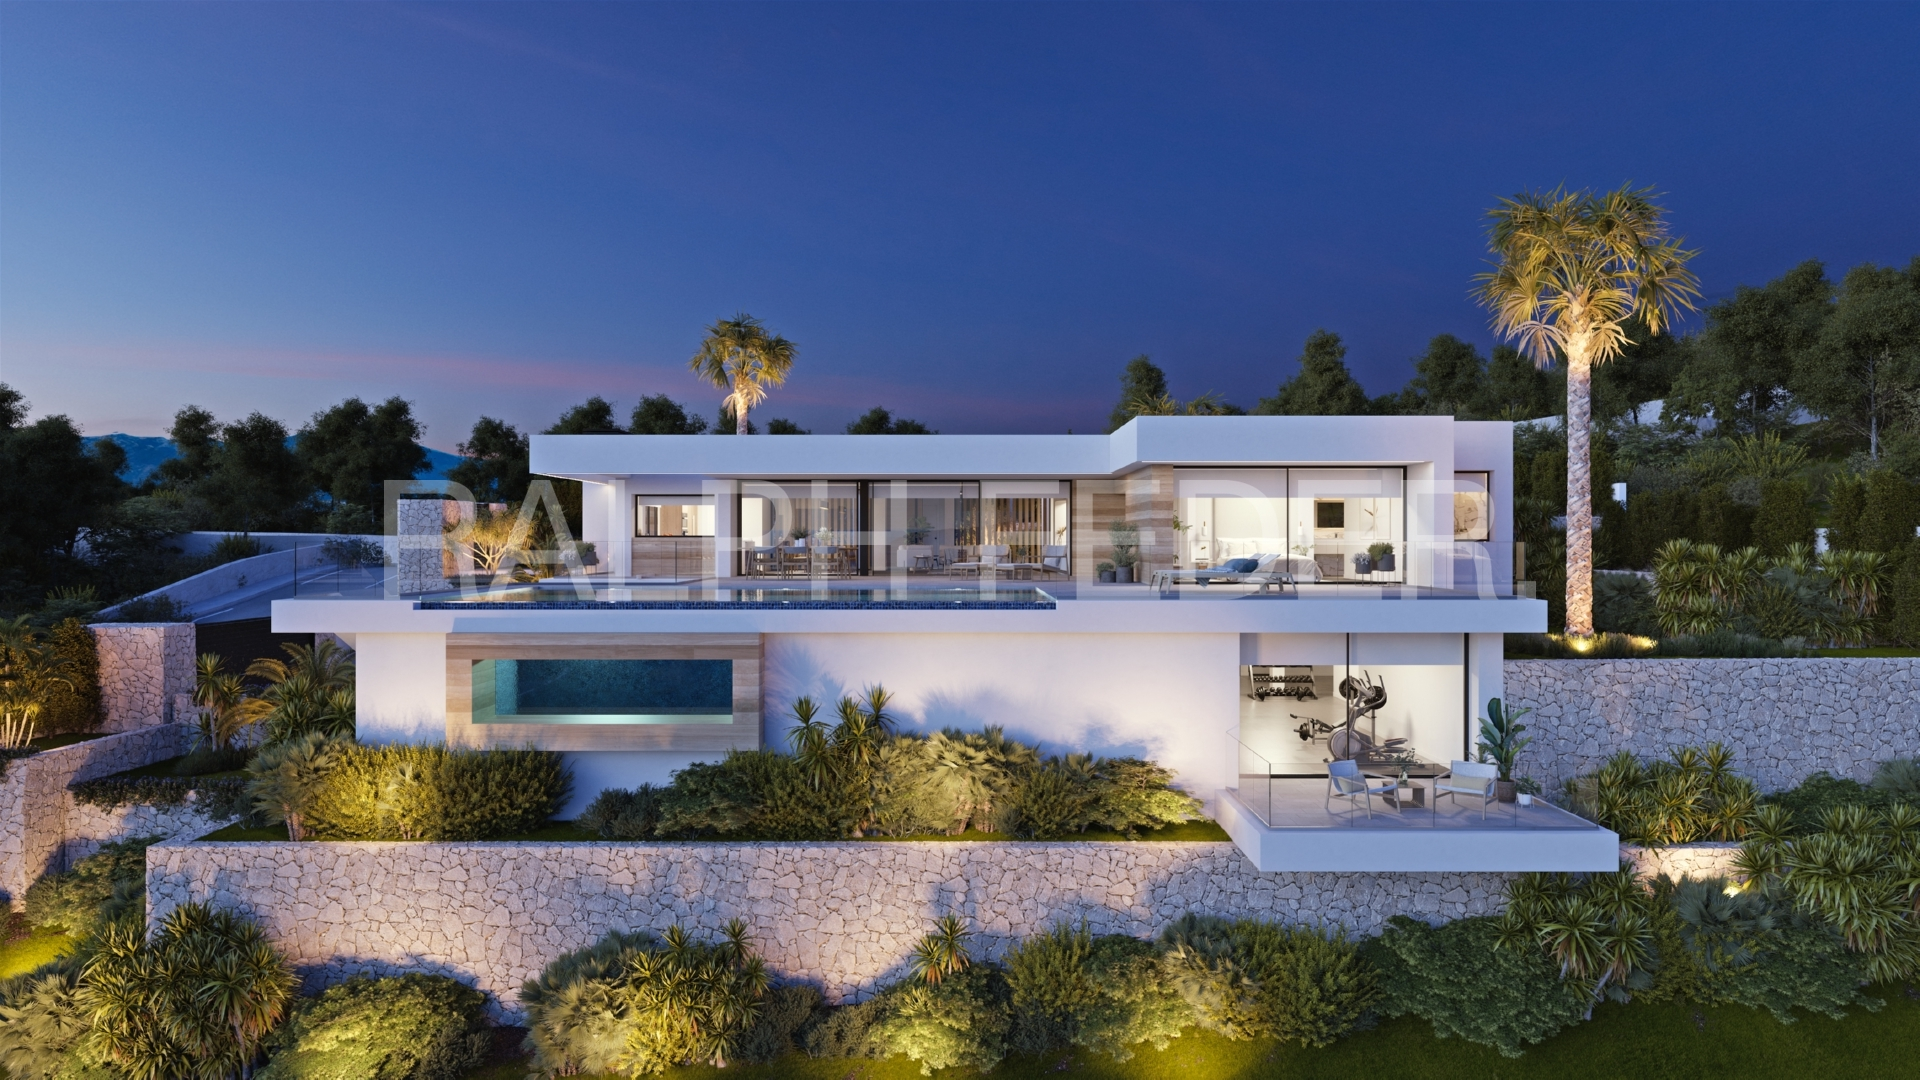 Vista nocturna exclusive project villa